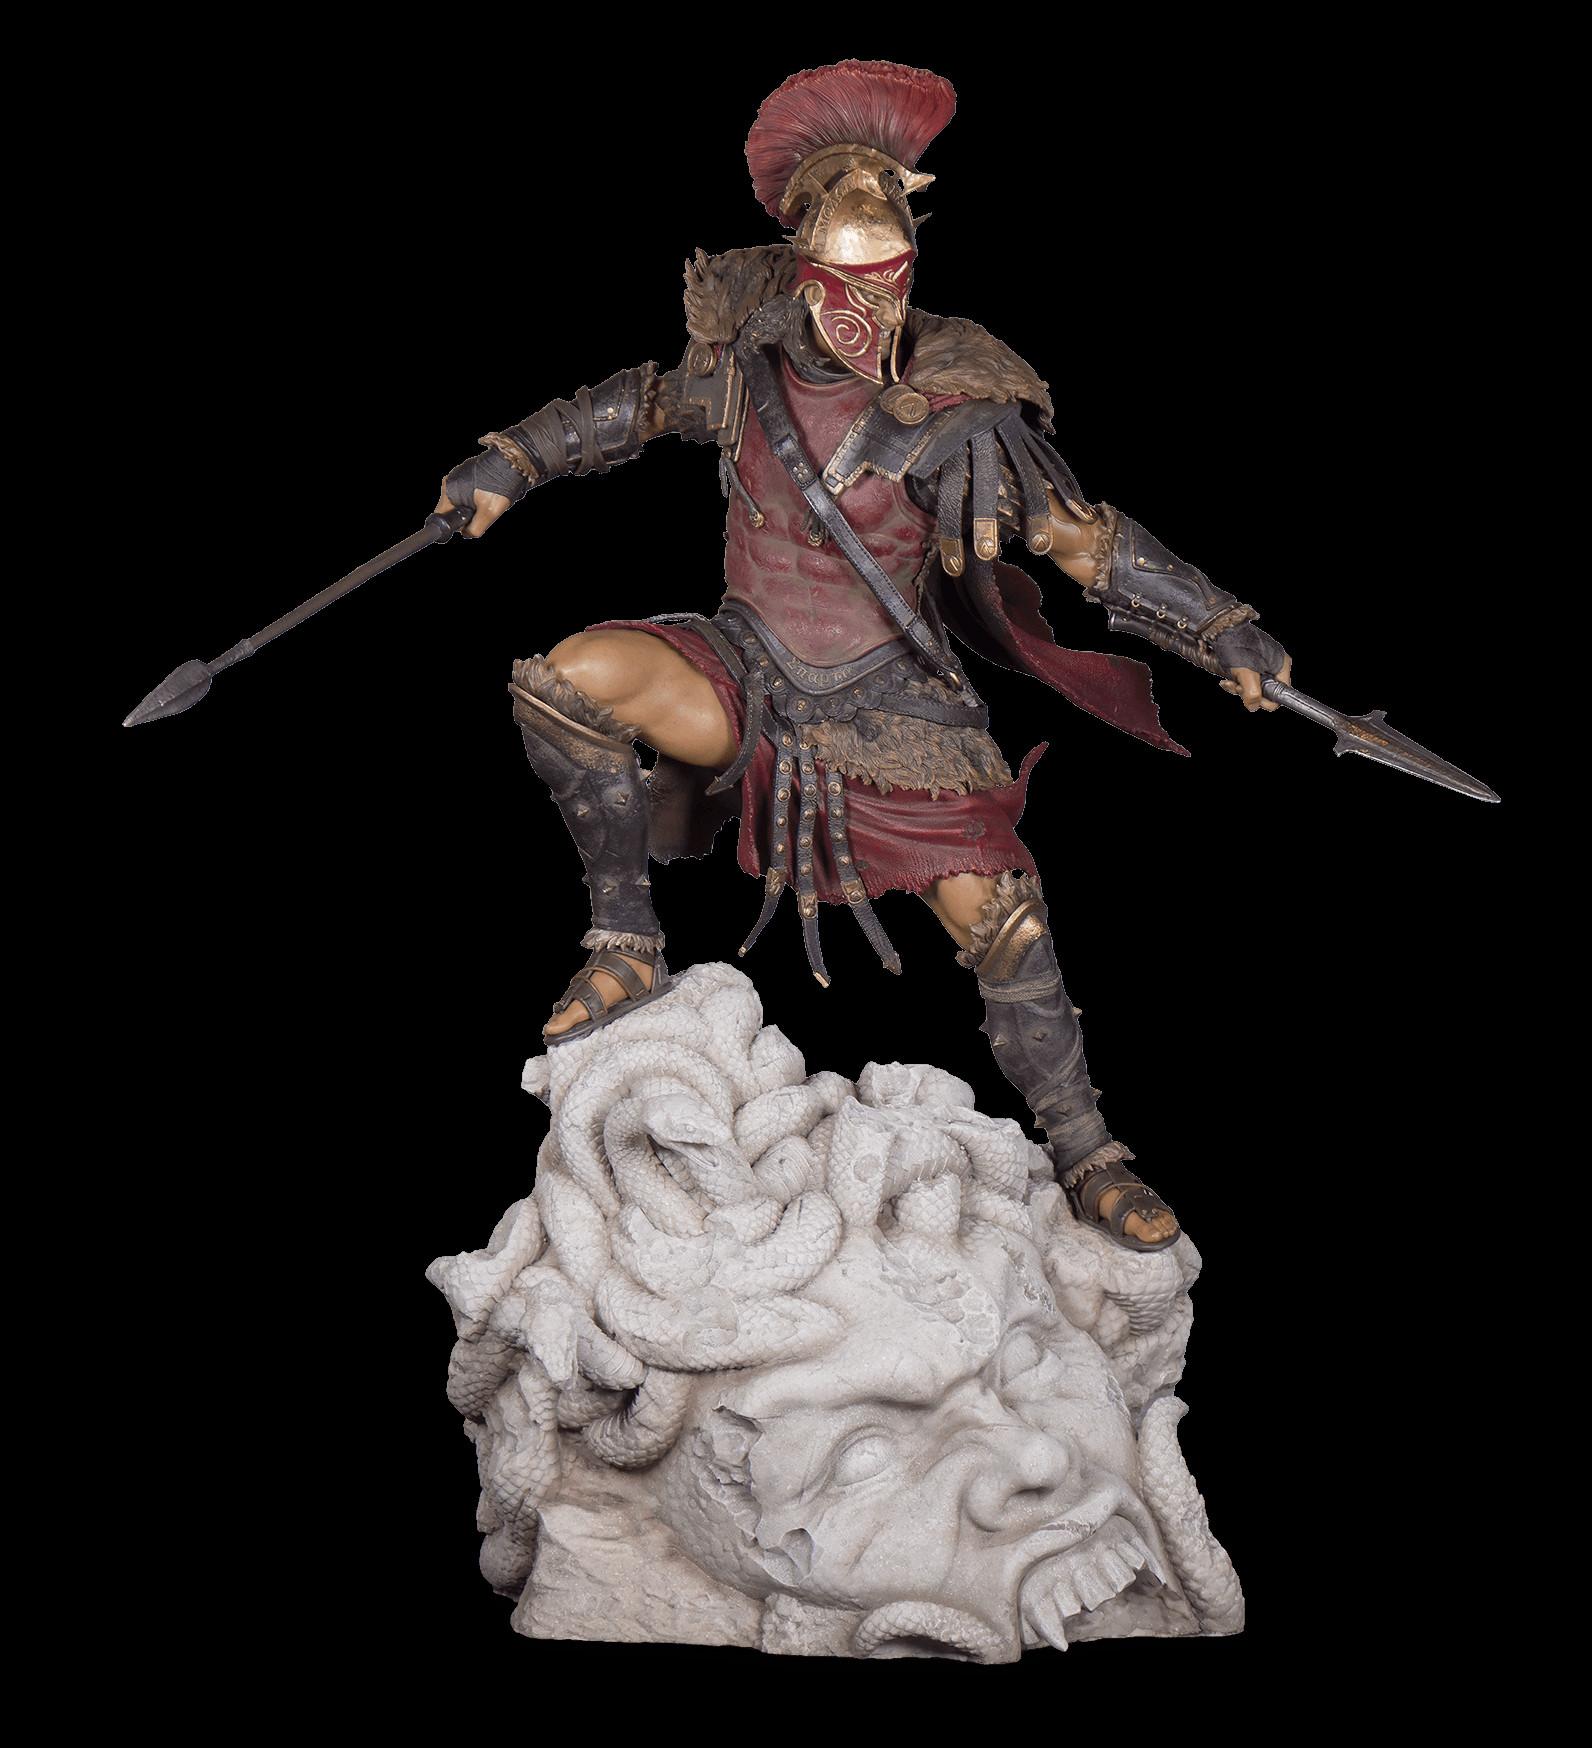 sabin-lalancette-alexios-figurine